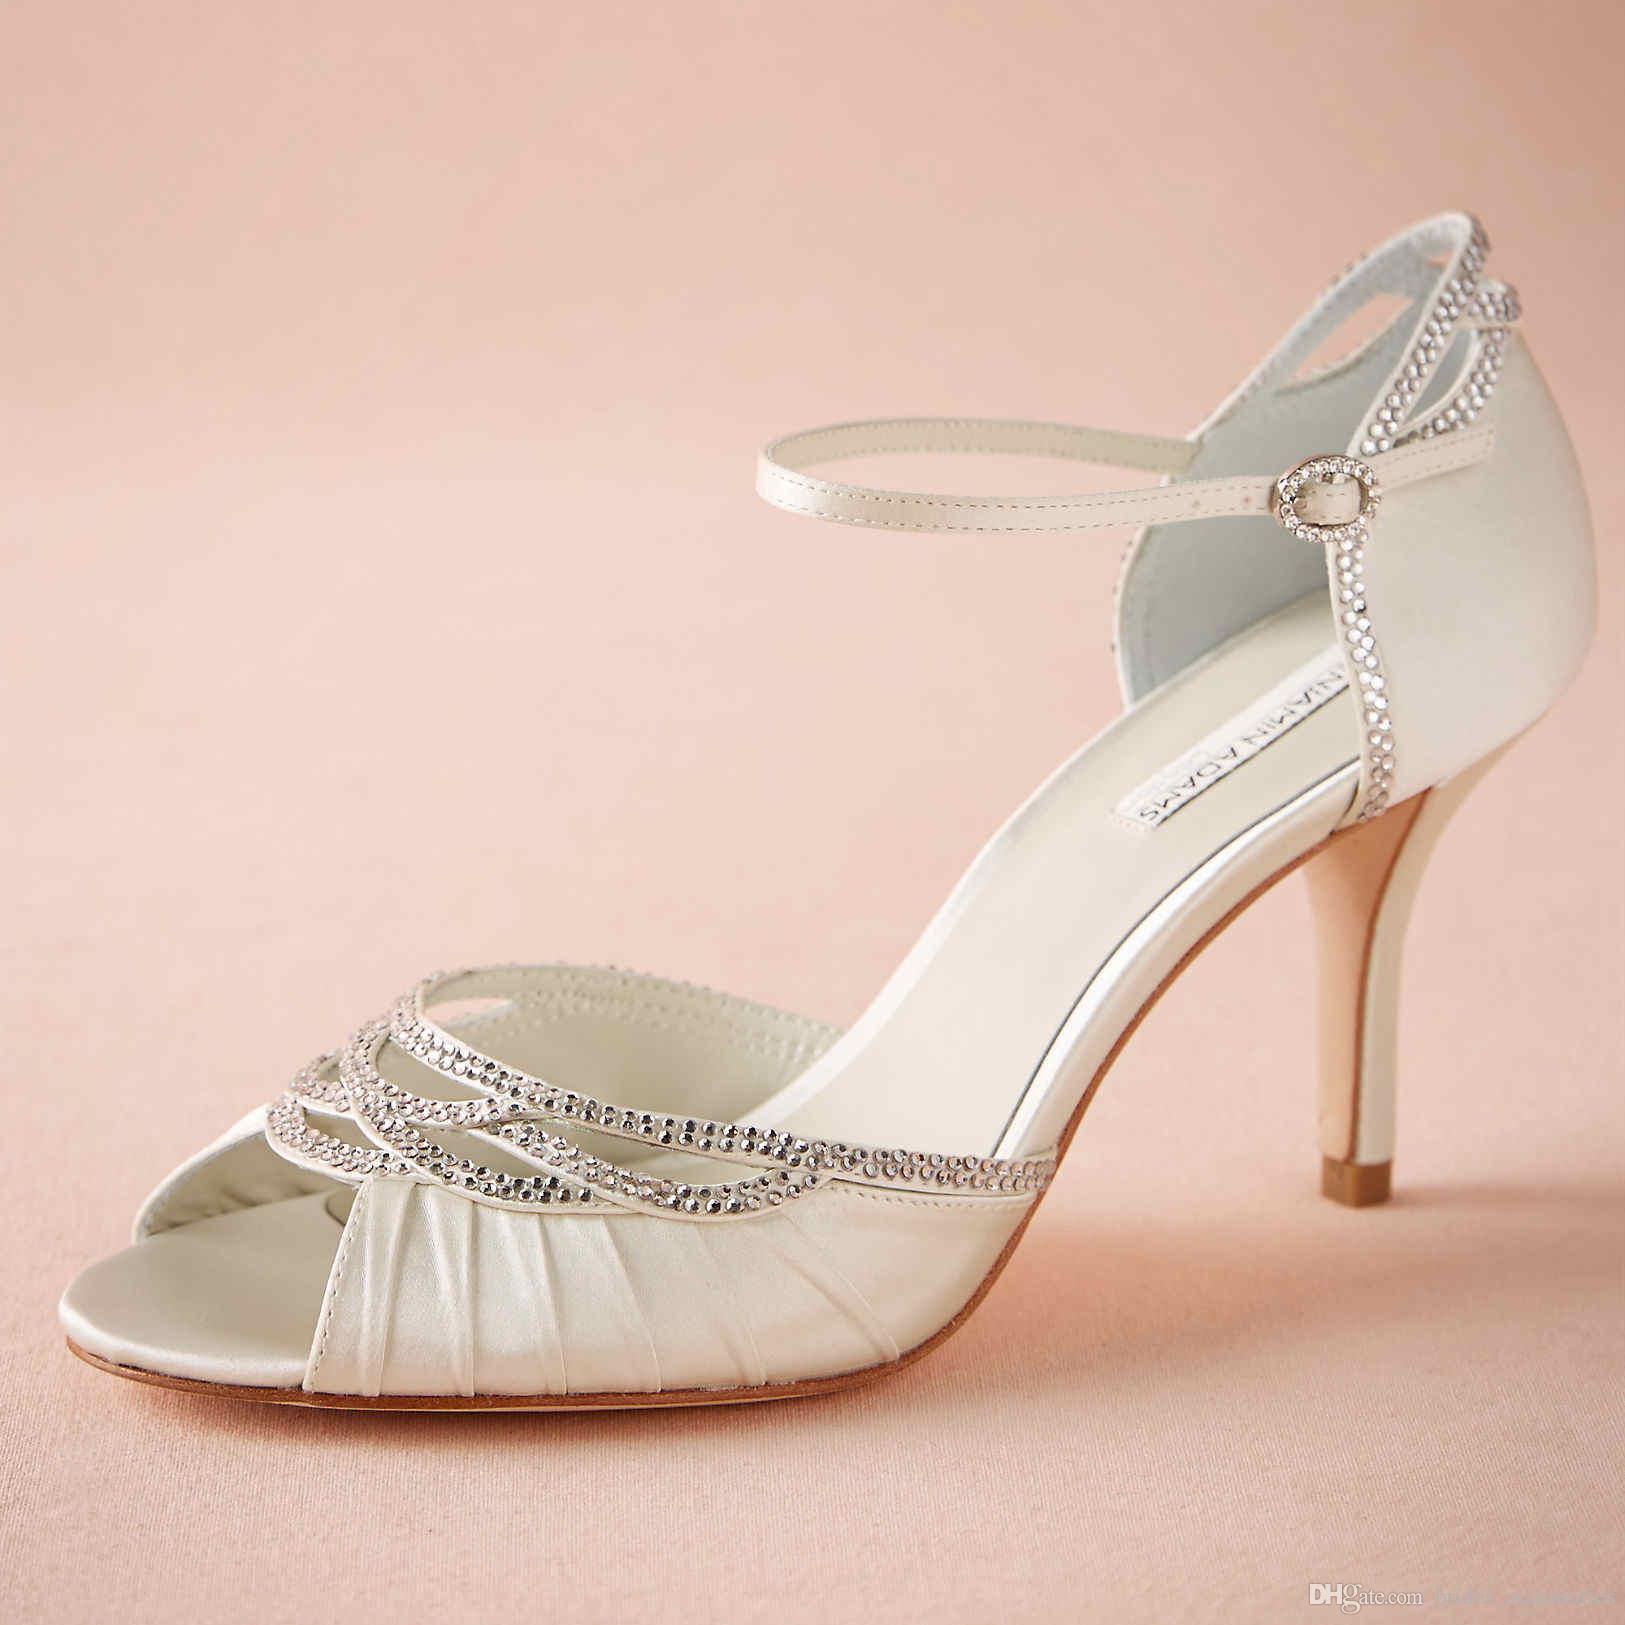 Custom Made Bridal Shoes Uk: Ivory Wedding Shoes Sandal Open Toe 2015 Women Pumps Wrap